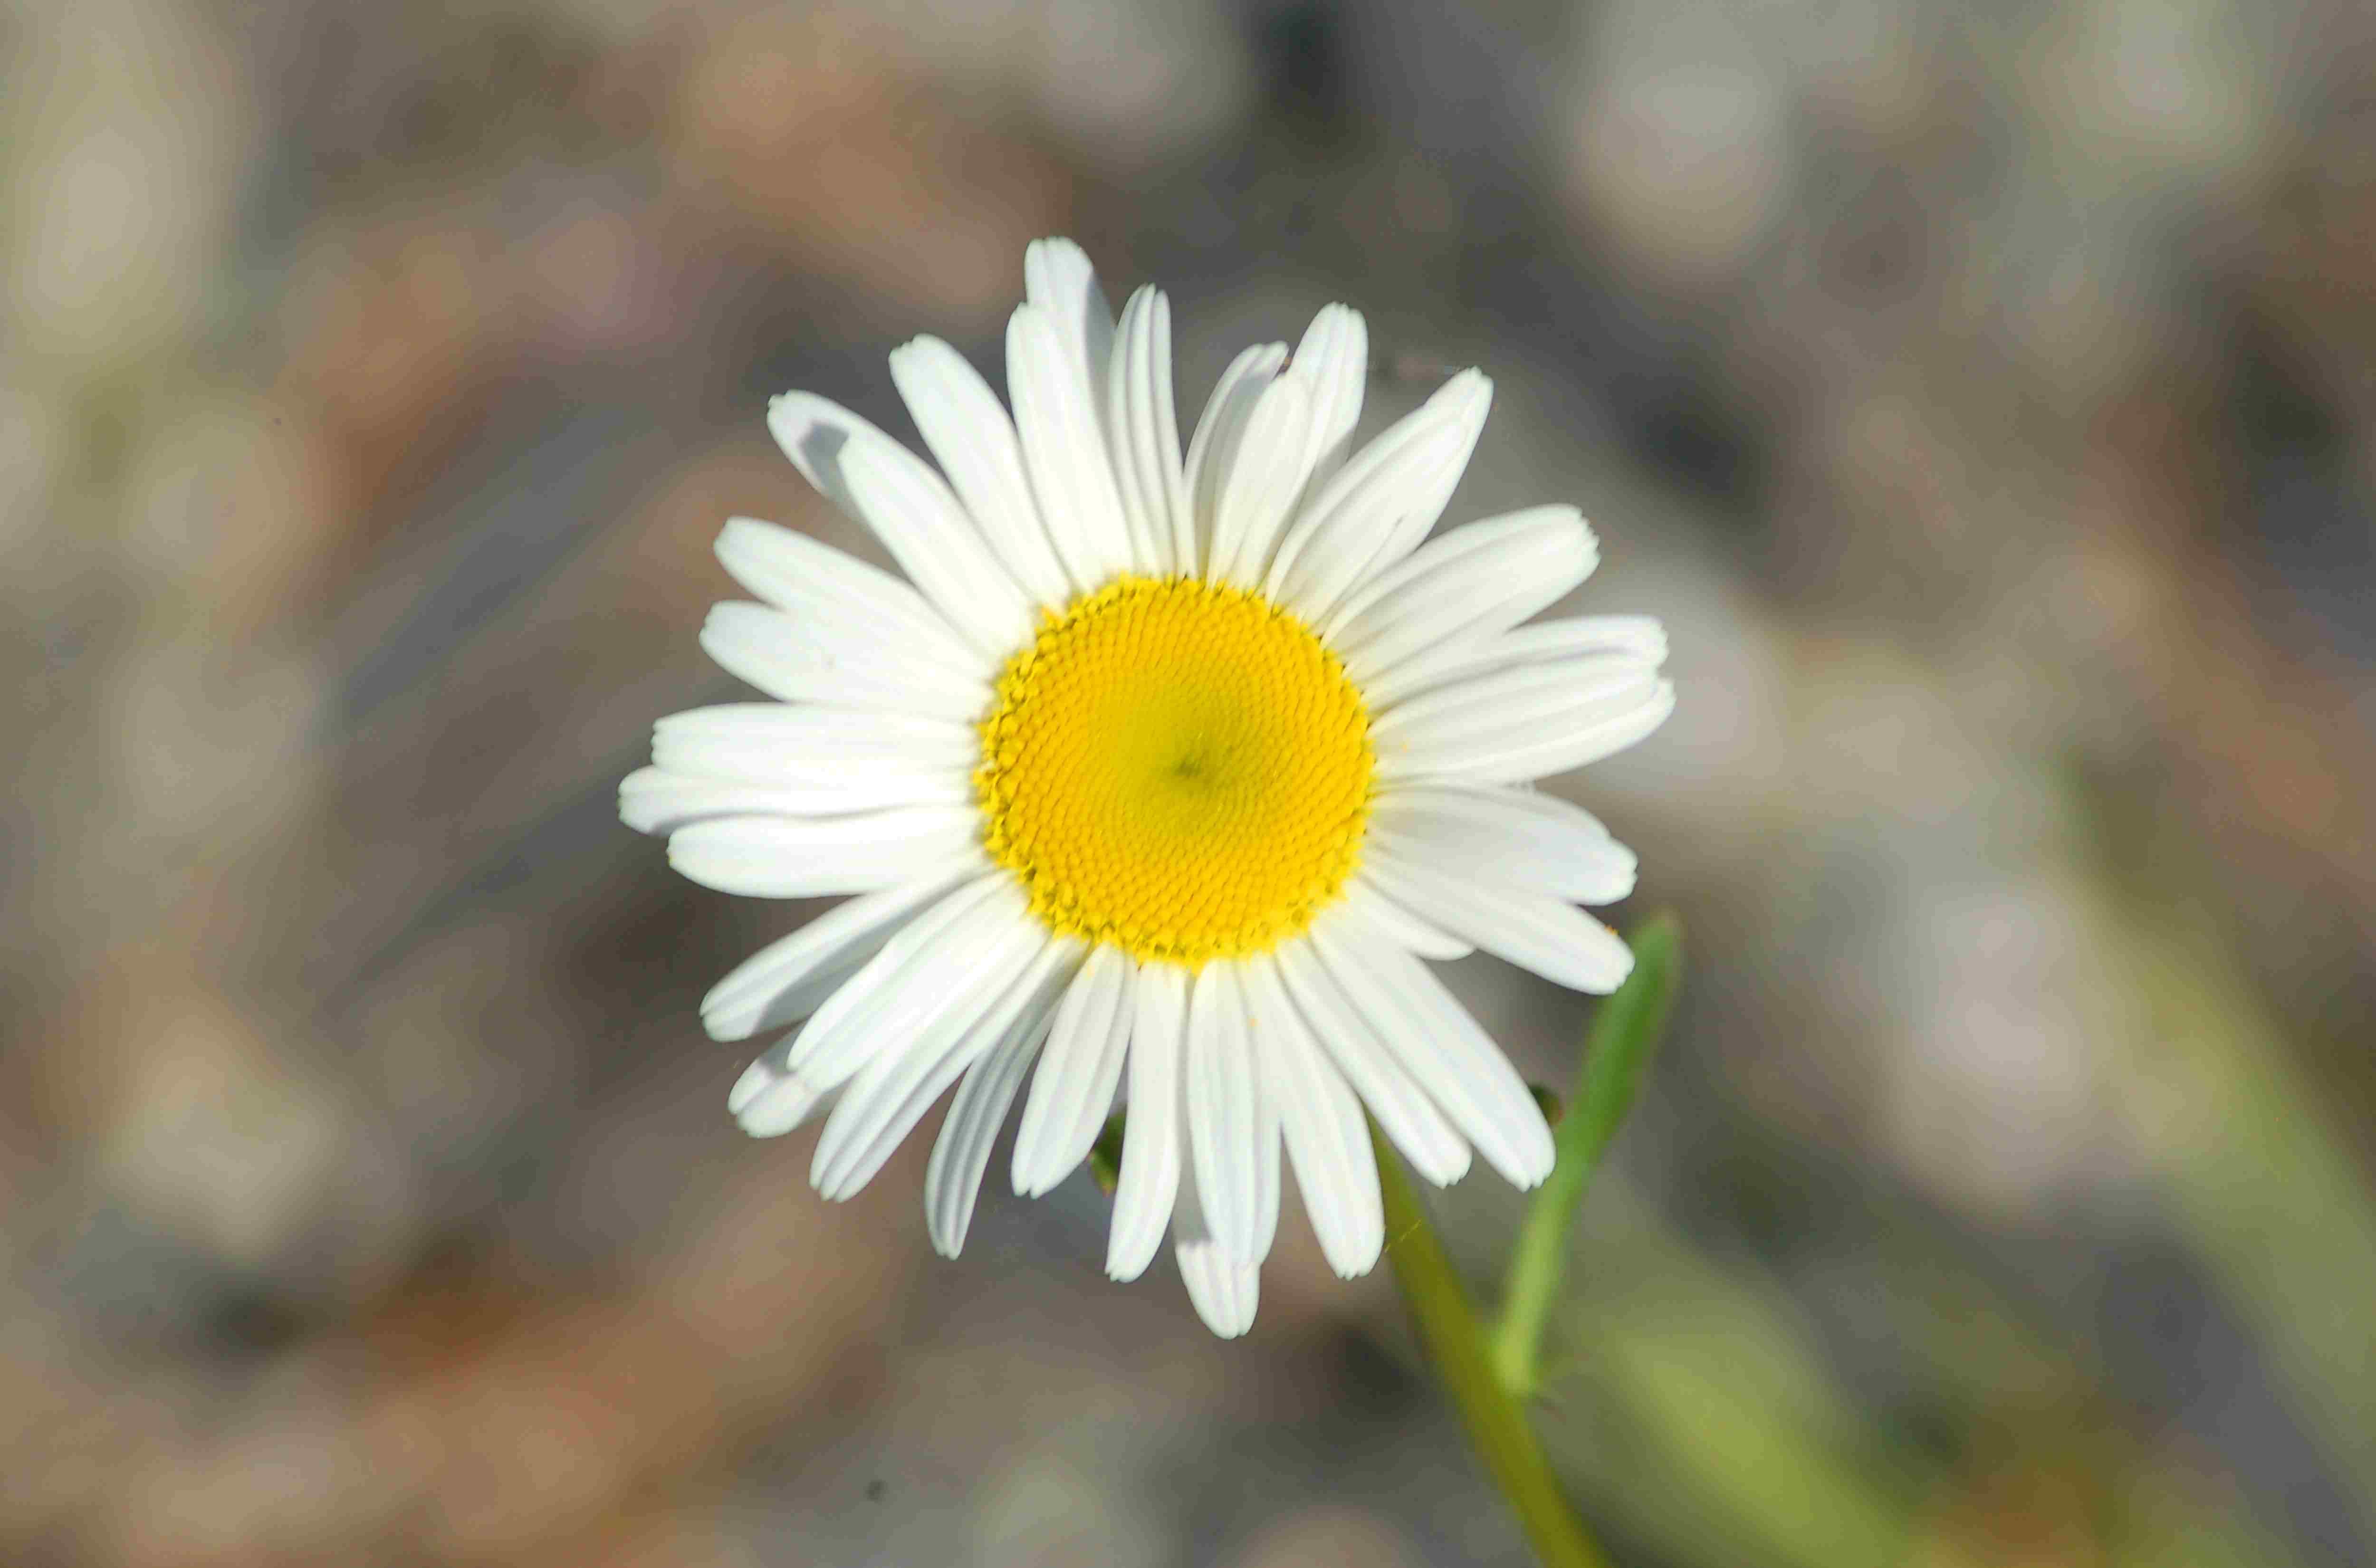 Becky shasta daisy flower closeup.